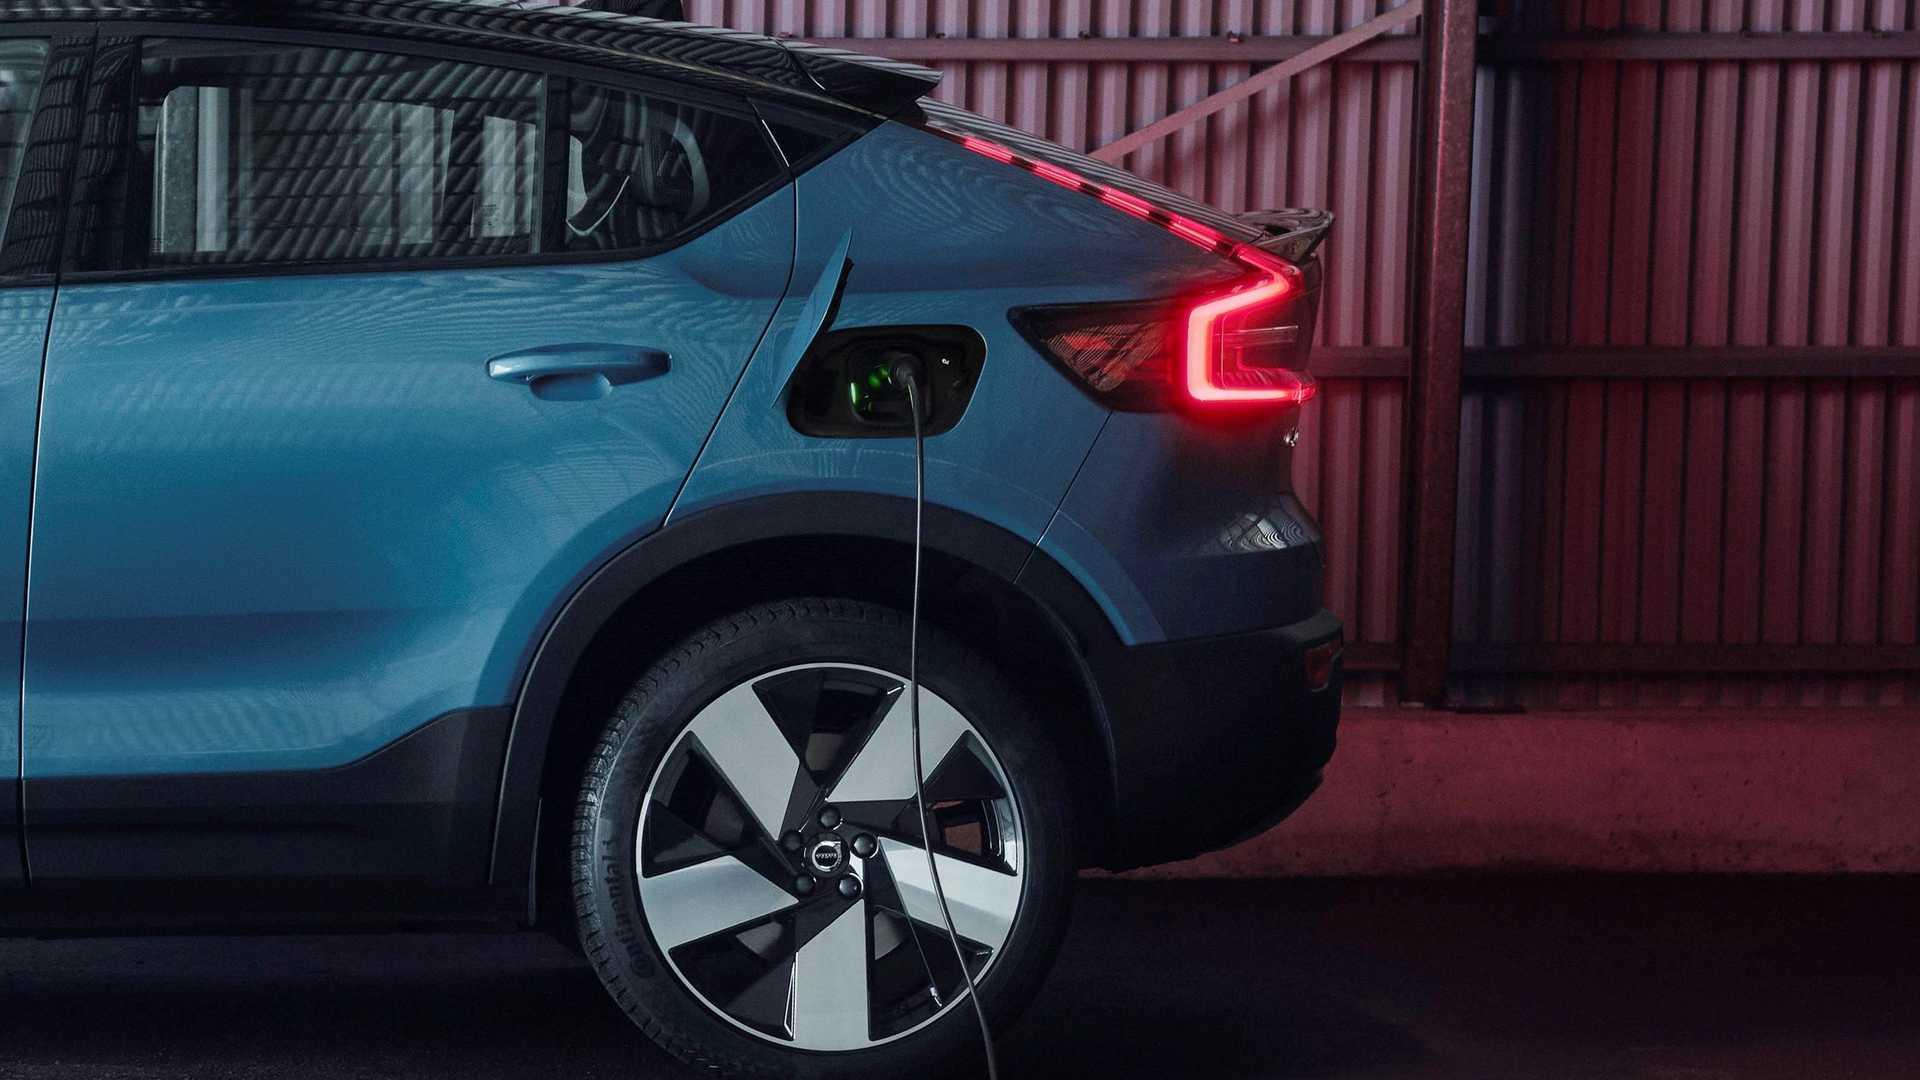 Volvo C40 Recharge Charging